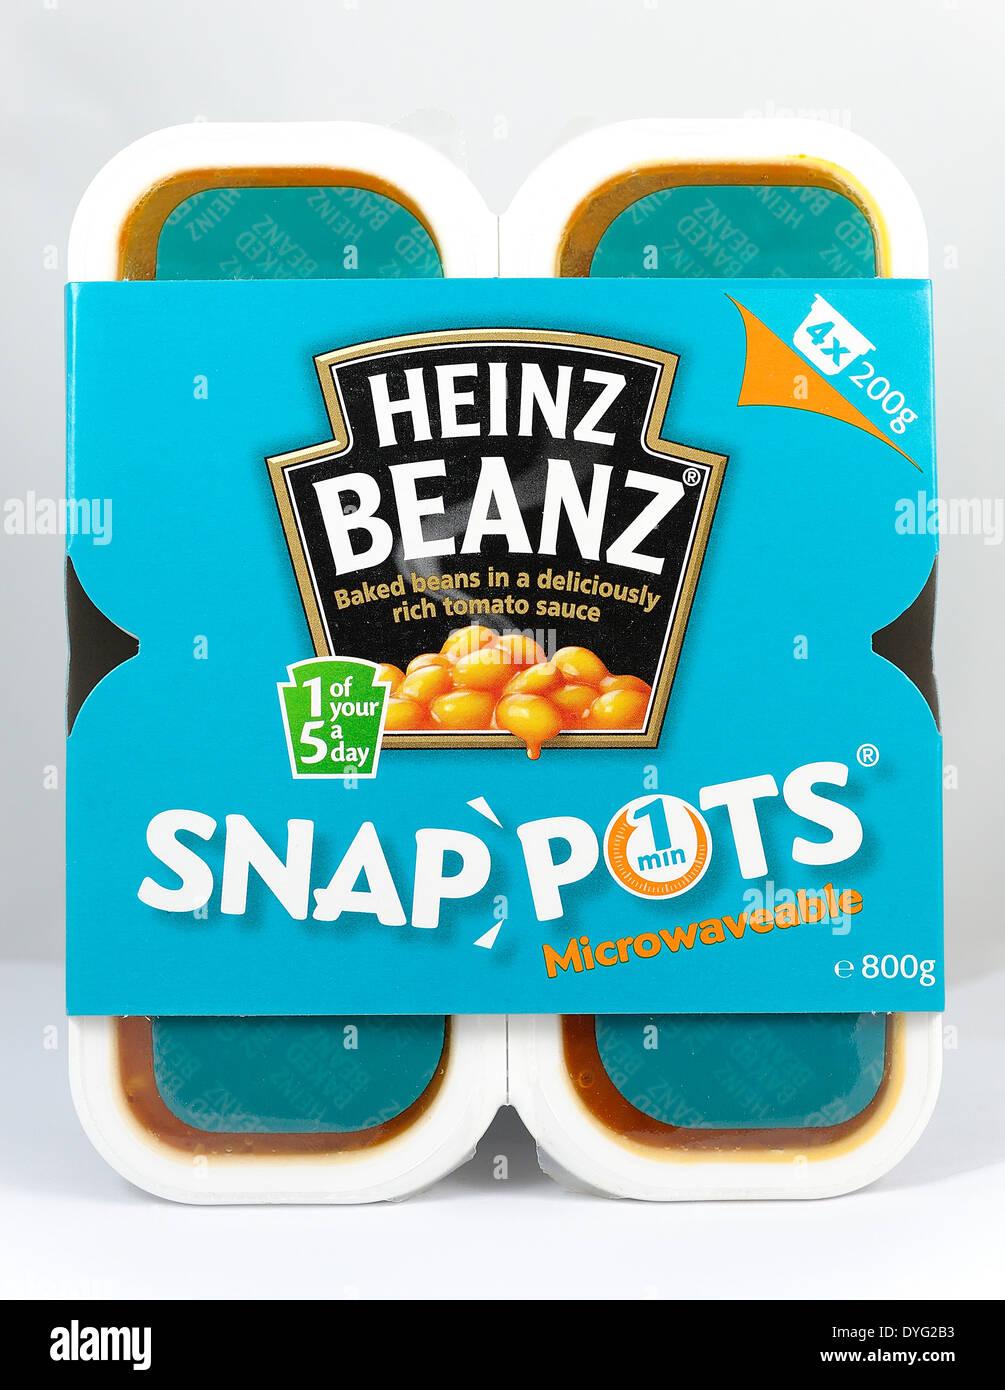 Heinz Beanz snap pentole microondabili fagioli snack Immagini Stock